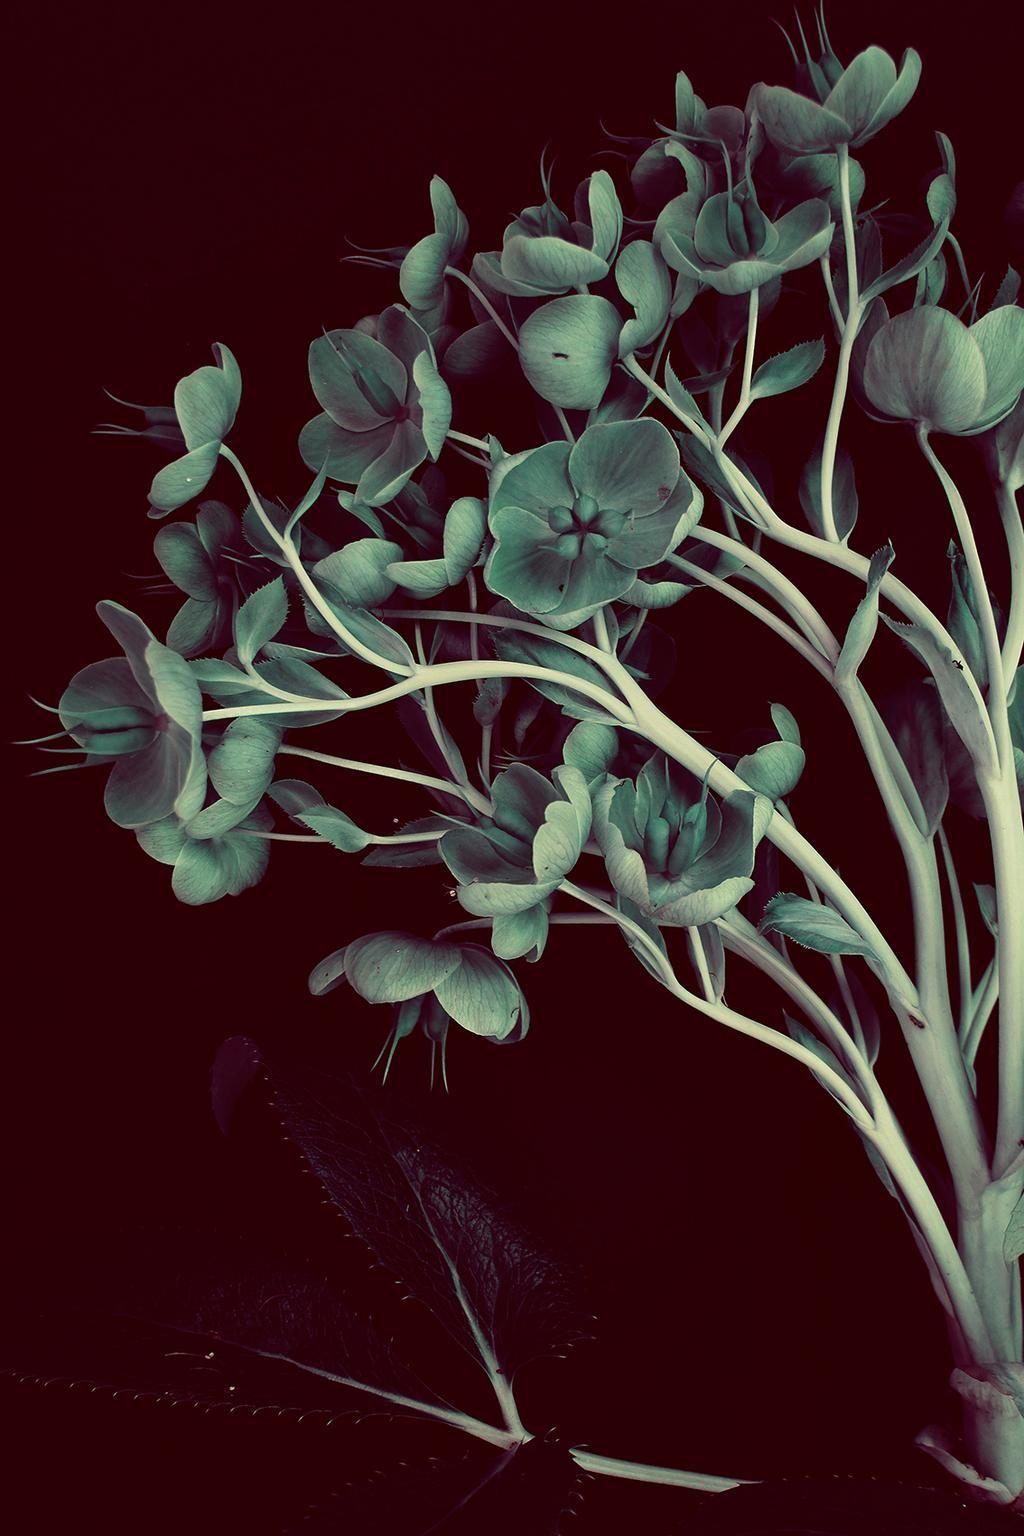 King Hellebore | Van Lieshout VI 2015 > #digital art #photography